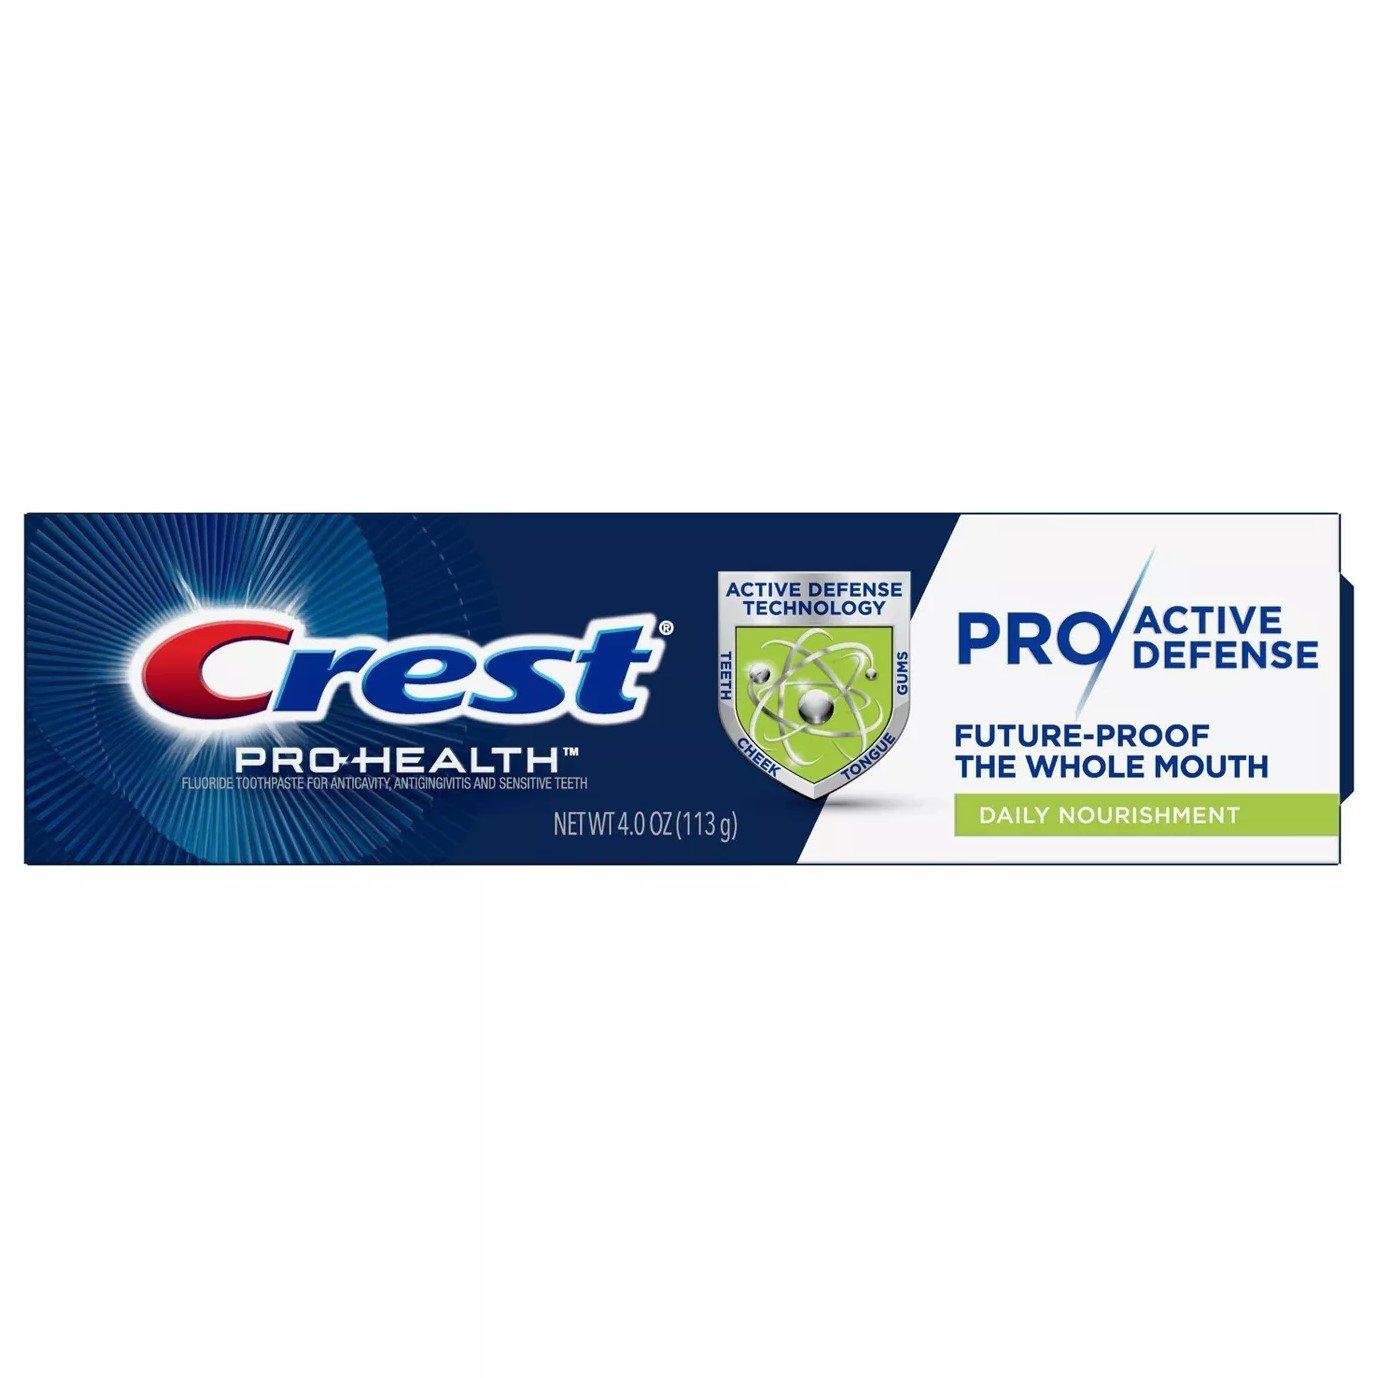 Crest Pro-Health Pro Active Defense Daily Nourishment Toothpaste 4 oz